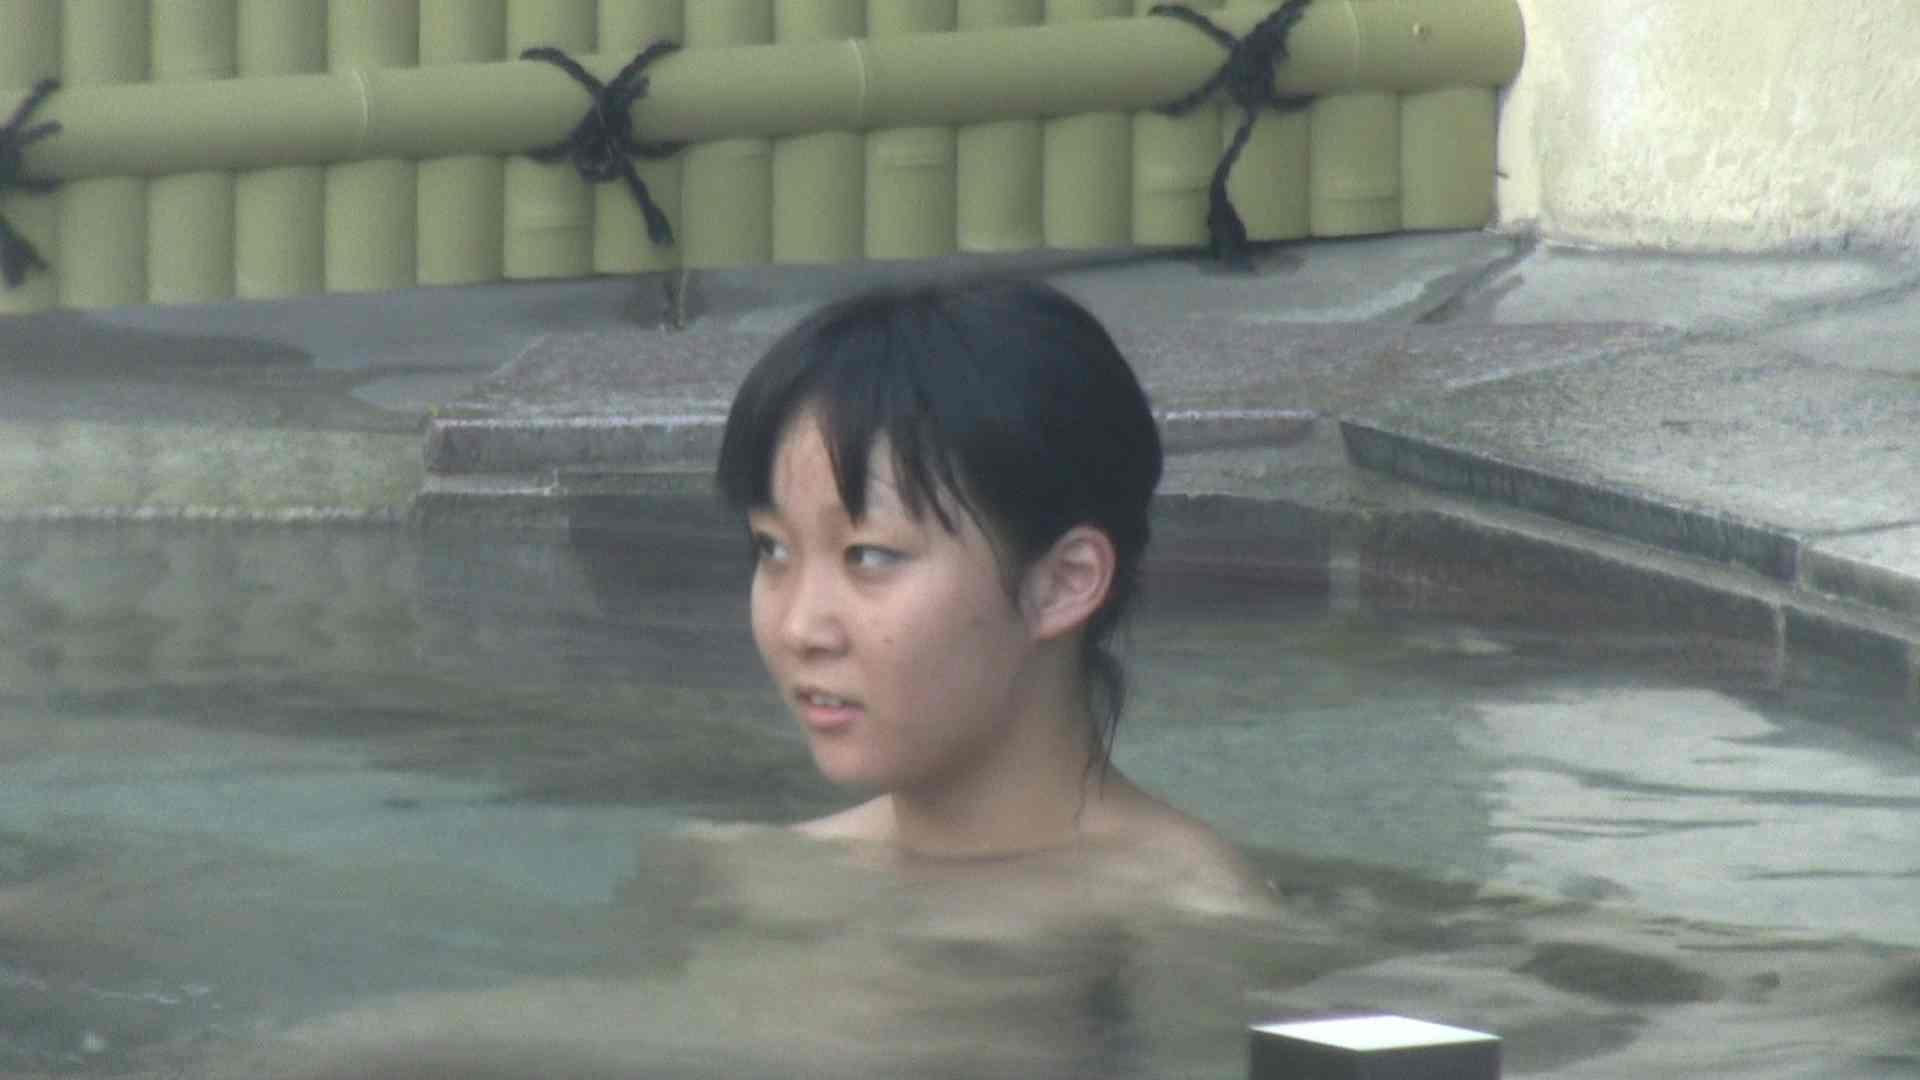 Aquaな露天風呂Vol.196 盗撮 オメコ無修正動画無料 56PICs 8